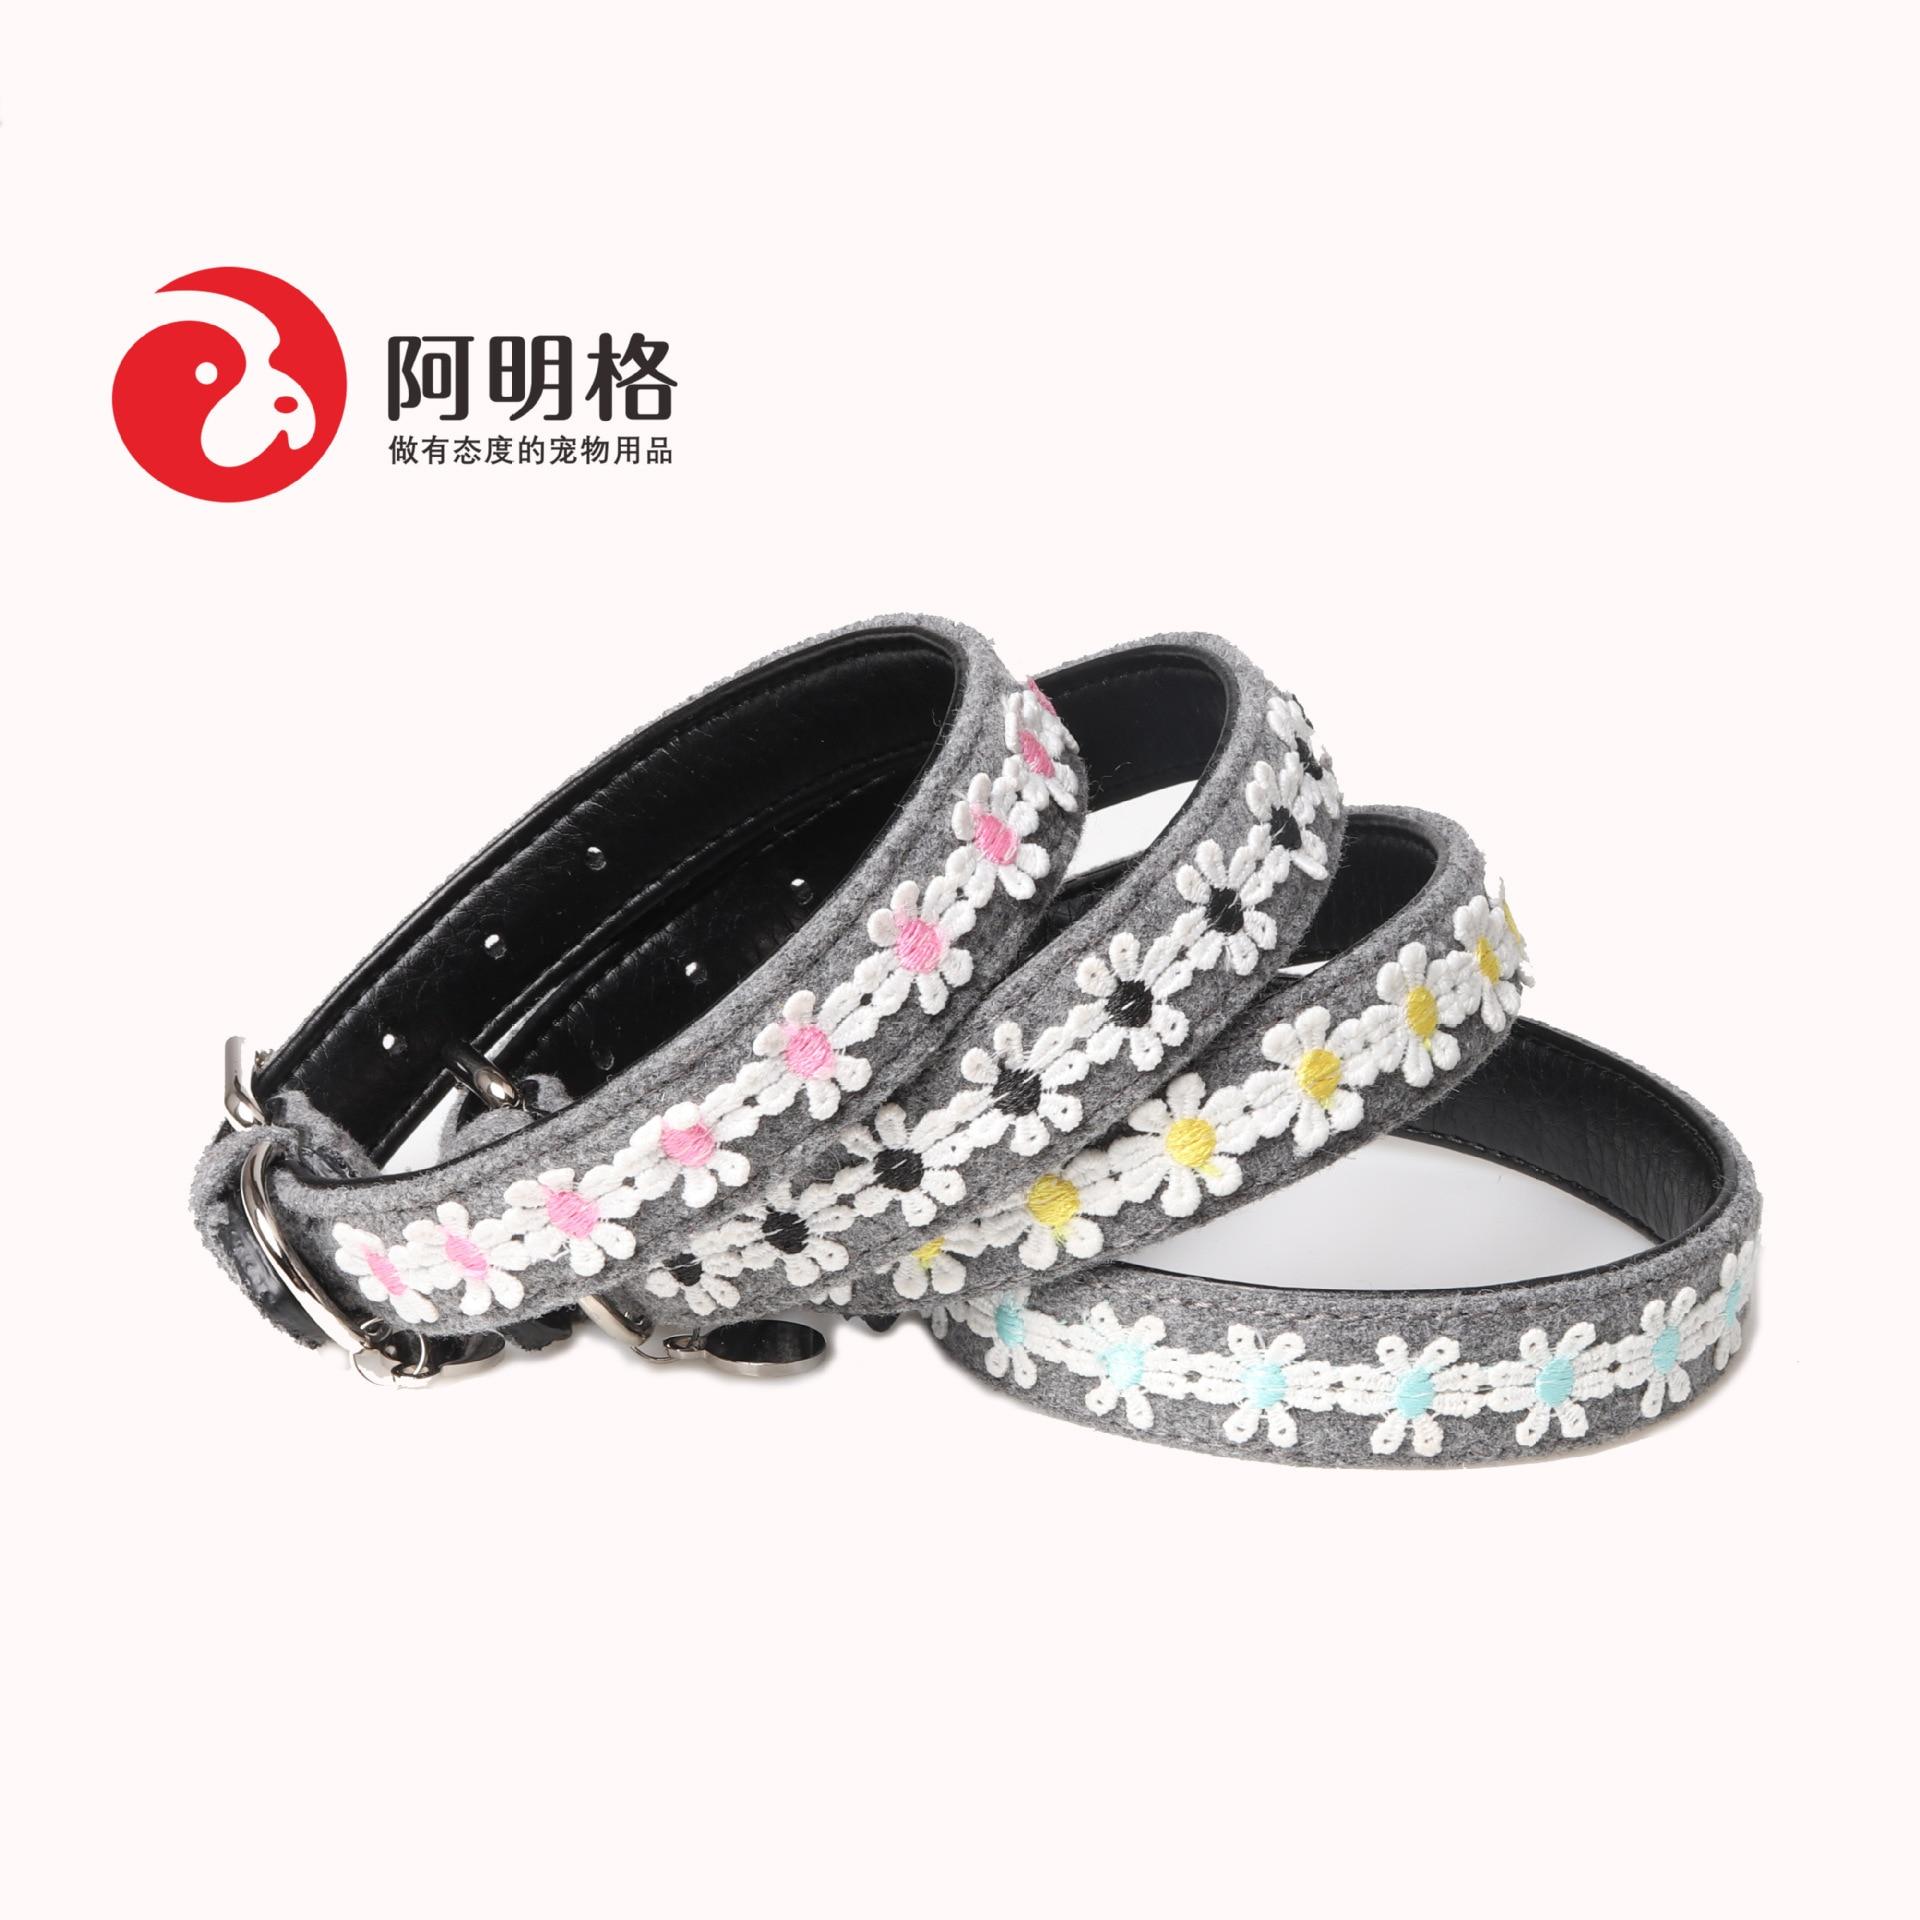 Jin Jie Te Embroidery Dog Neck Ring Cloth? Pet Collar Dog Supplies